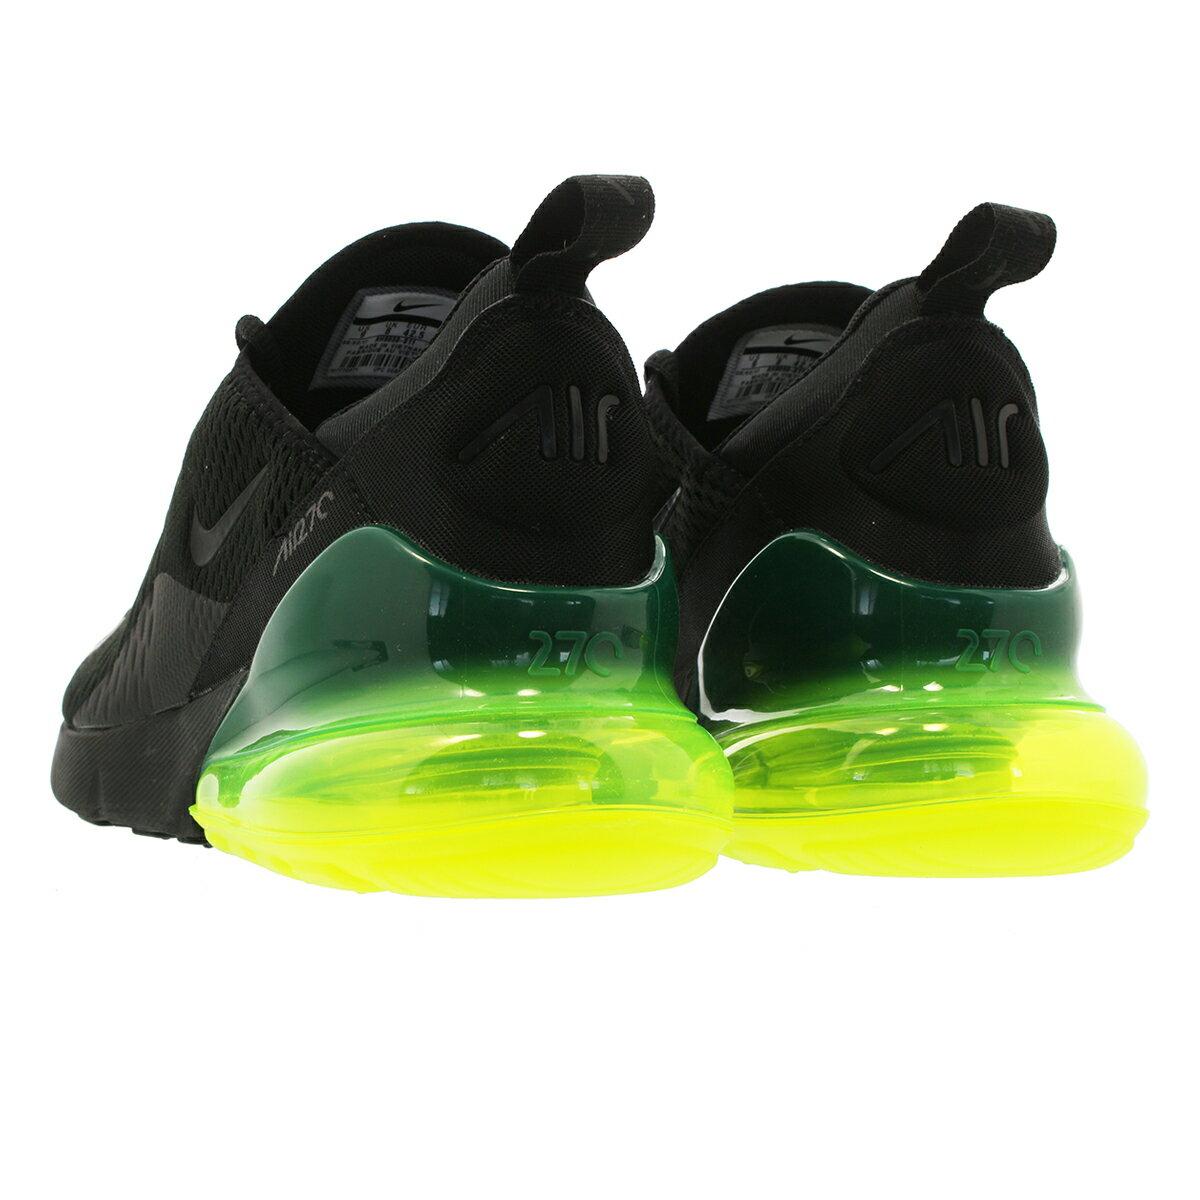 Shop Nike Air Max 270 AH8050 011 BlackNeon Green in 2019